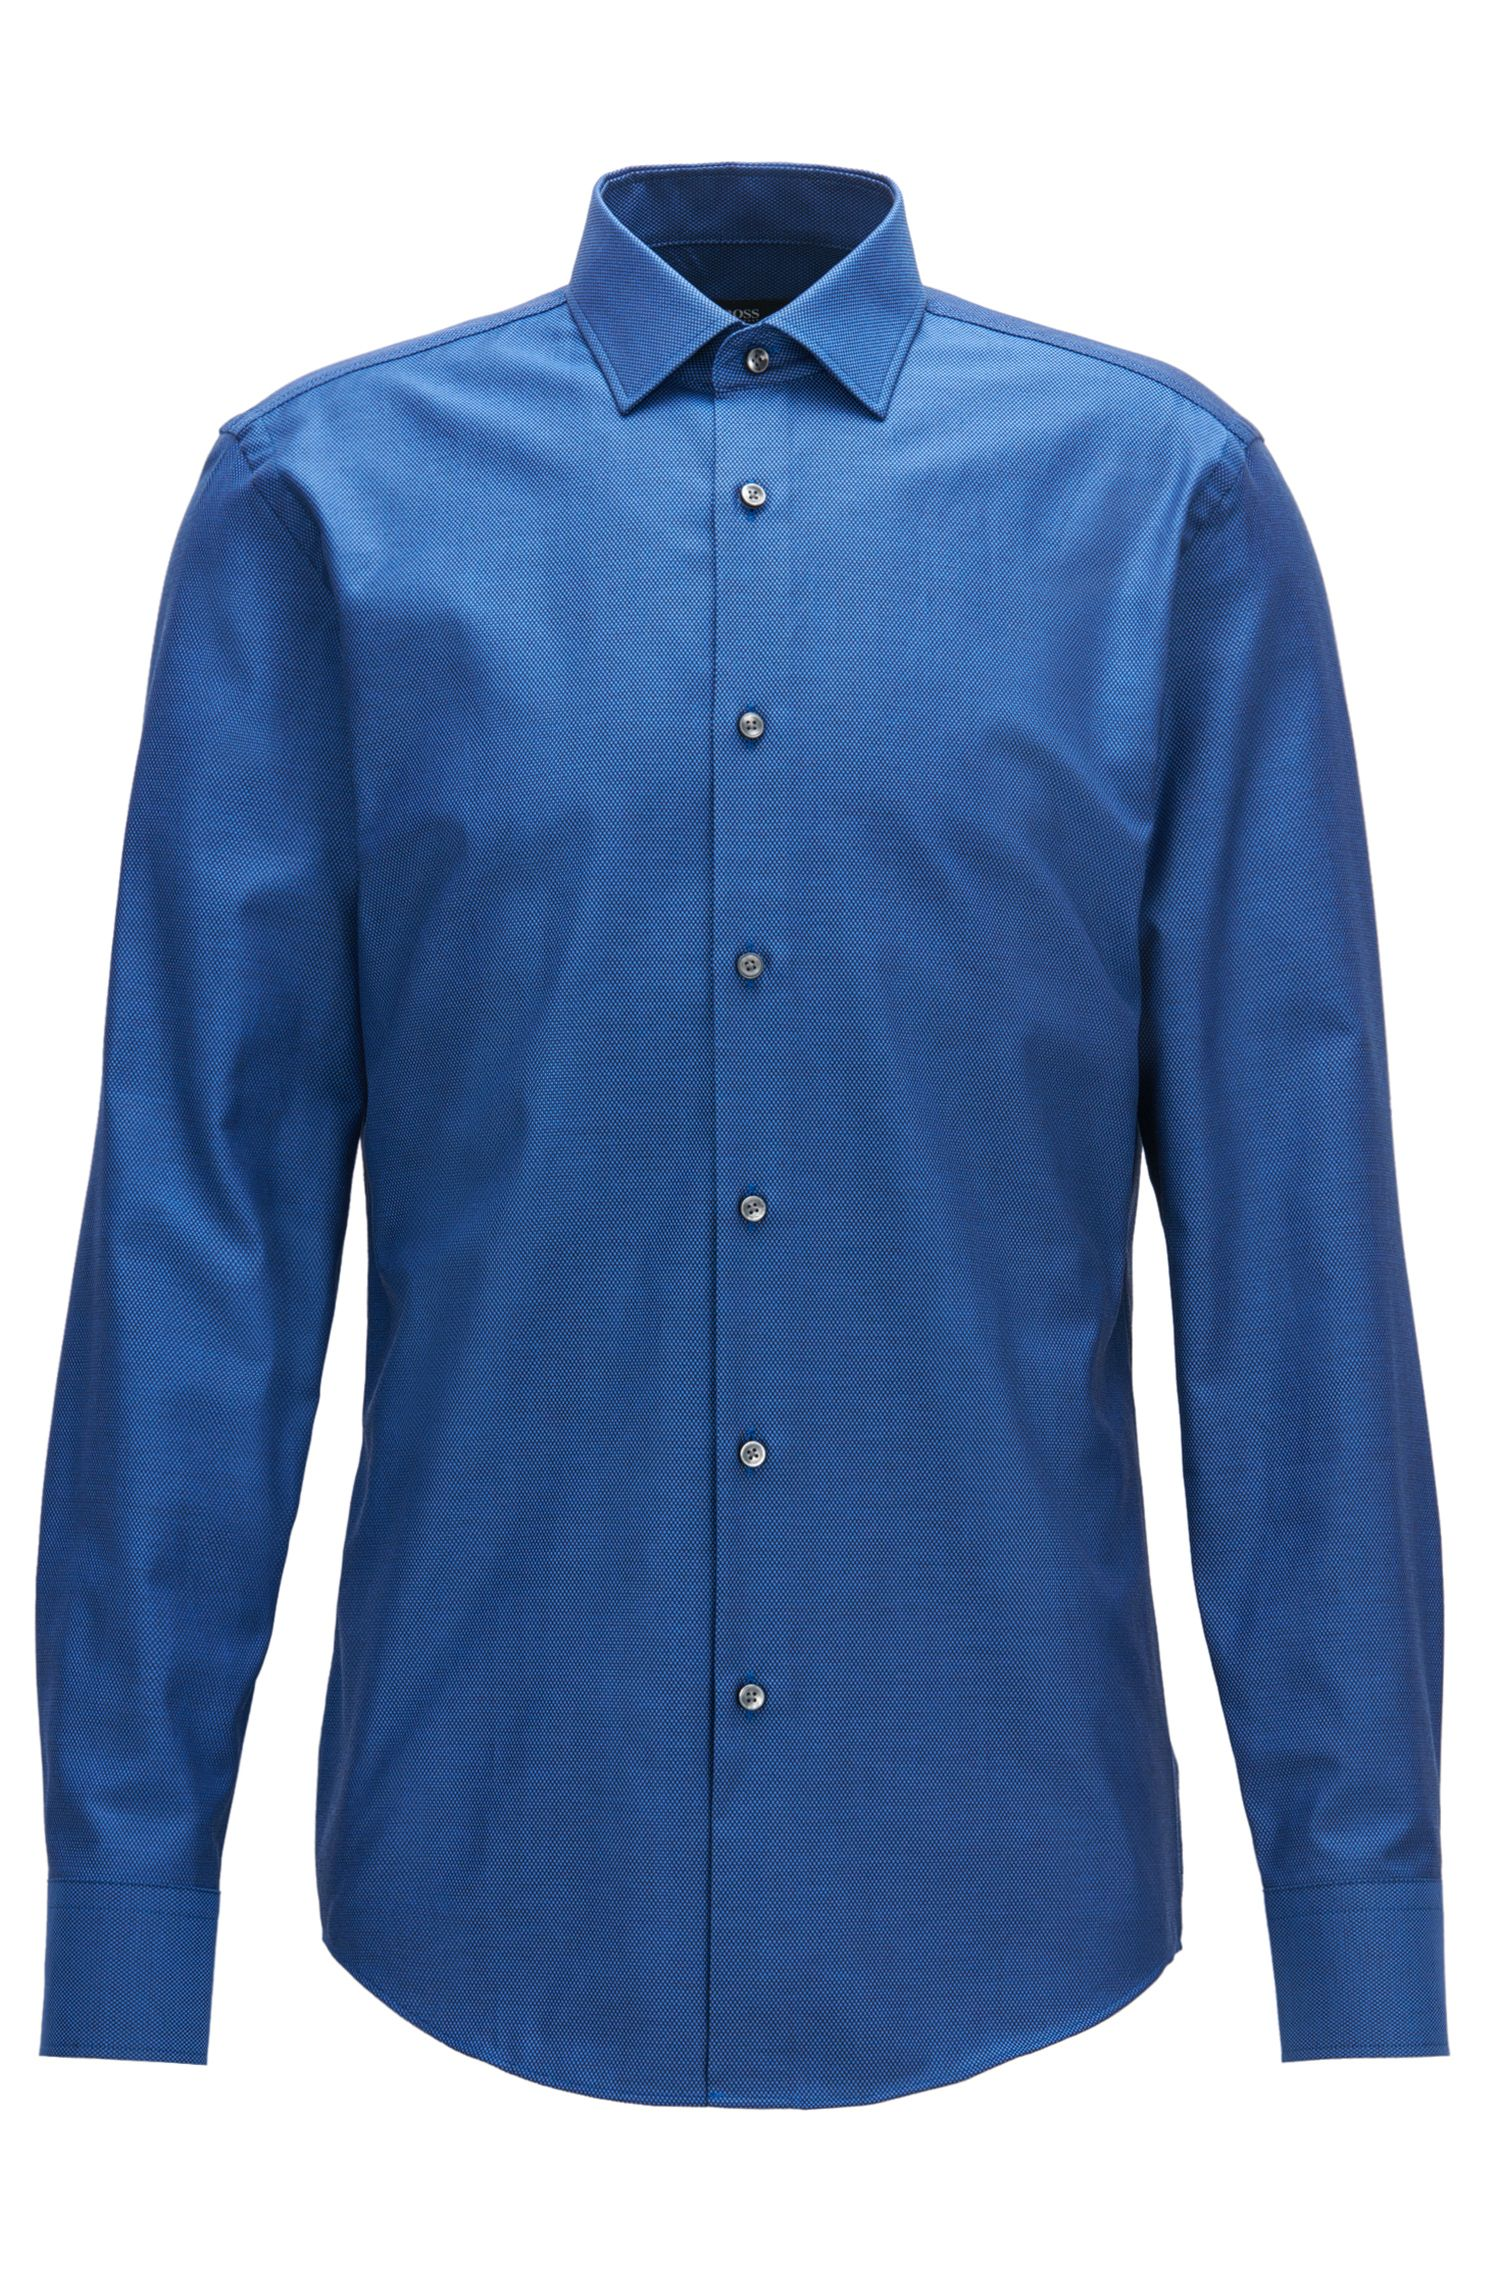 Birdseye Cotton Dress Shirt, Slim Fit | Jenno